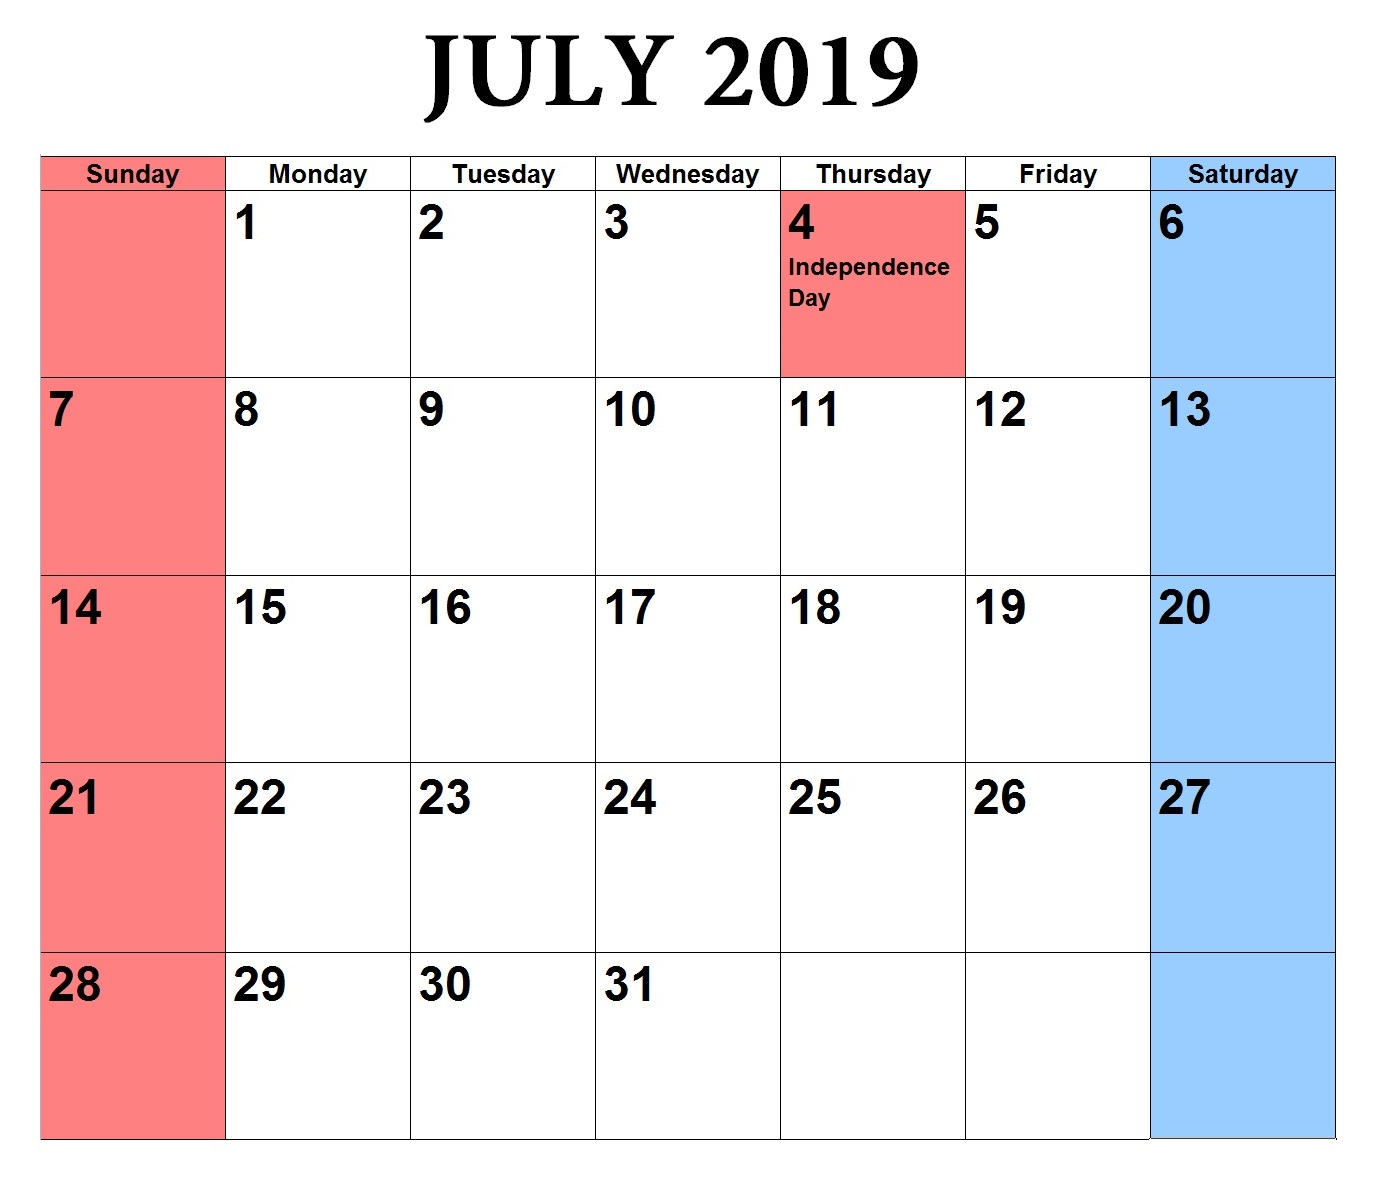 Download July 2019 Word Calendar